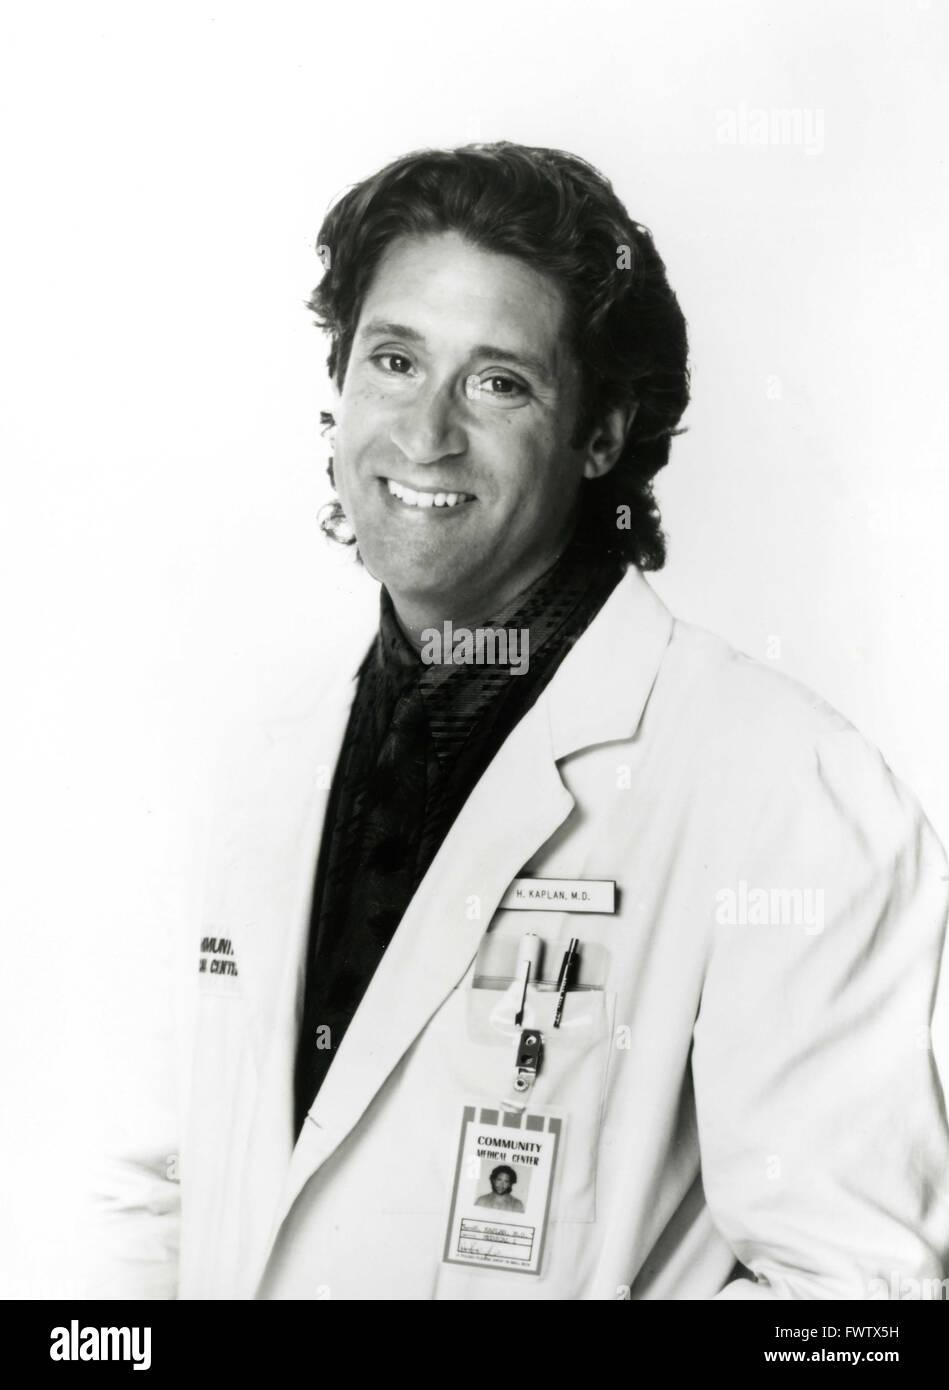 Kip Gilman as Dr. Hank Kaplan Nurses in the TV series, USA 1993 - Stock Image